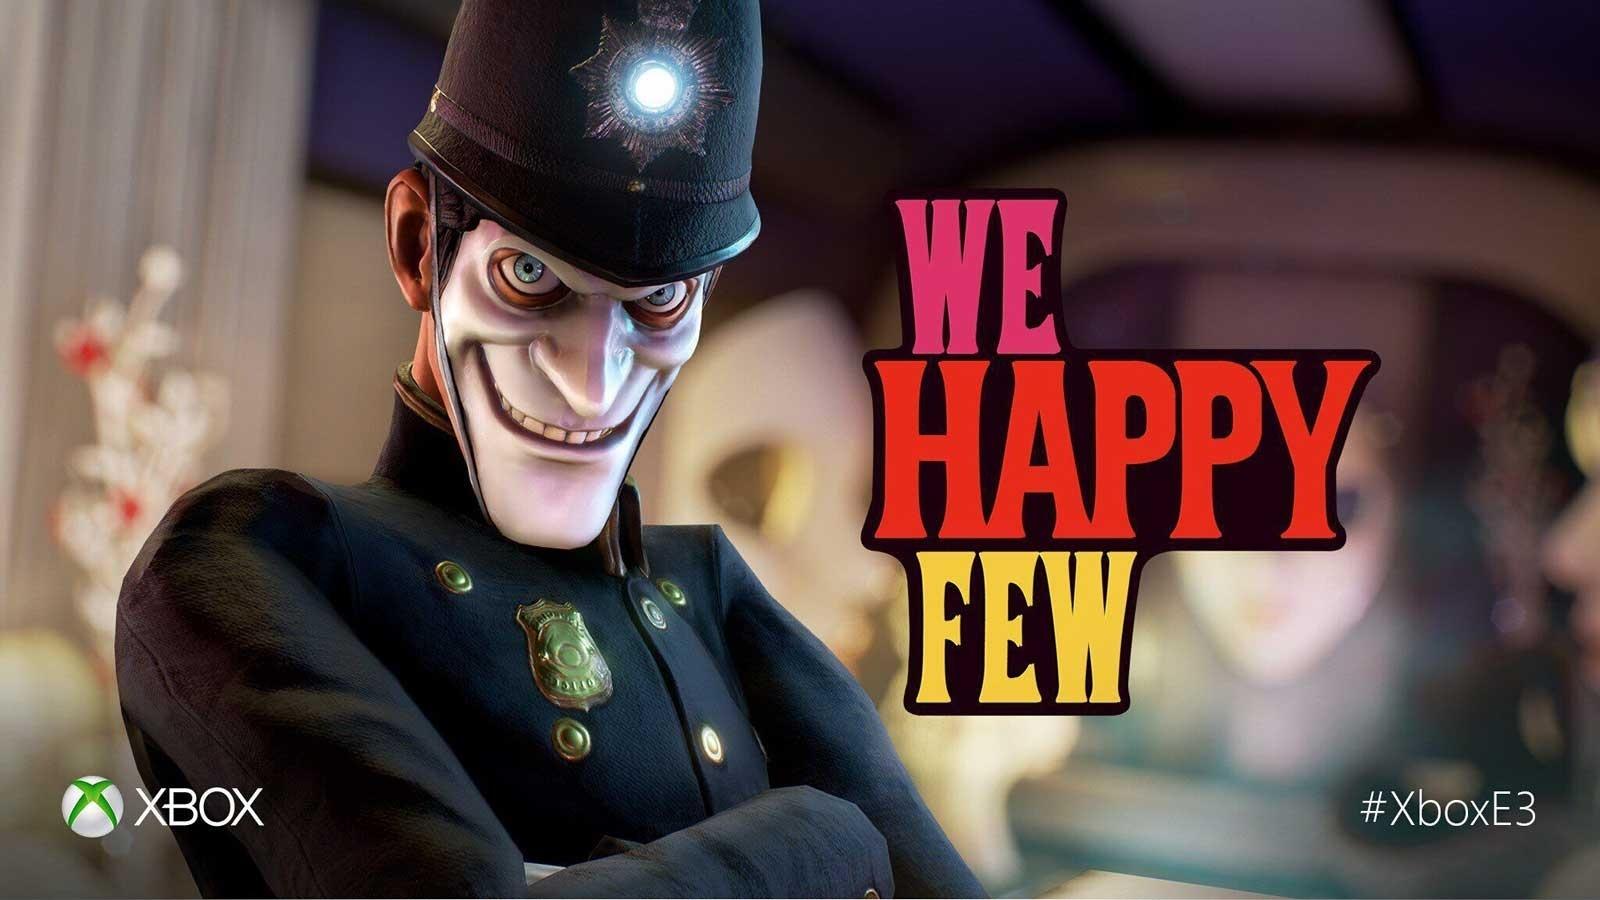 獵奇遊戲《WE HAPPY FEW》公佈發售日